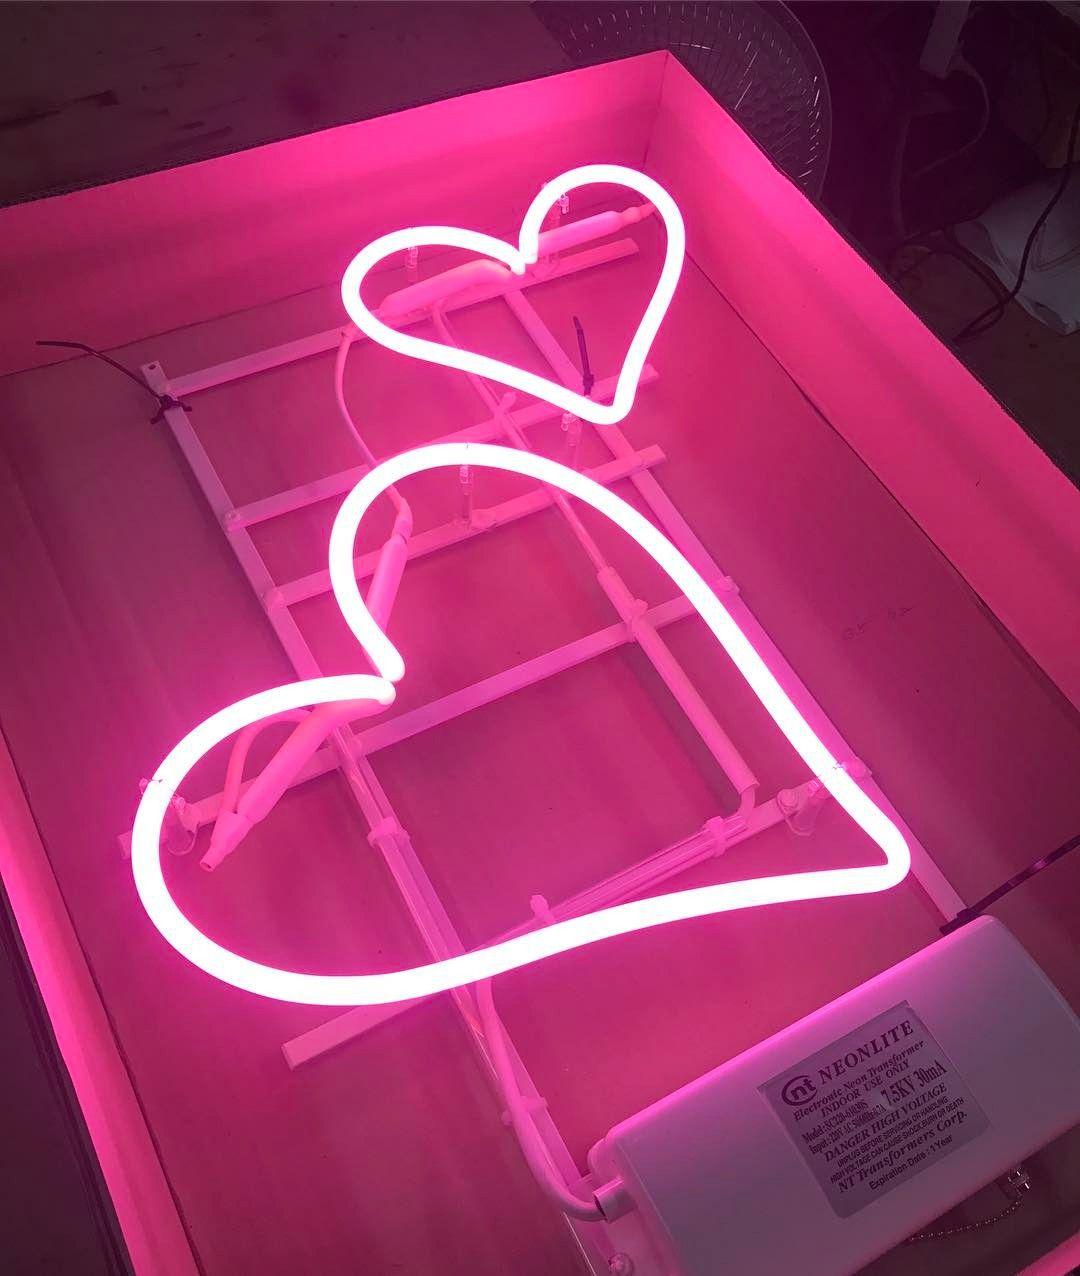 pinterest/mayaxgrce insta/appealthreads Neon aesthetic